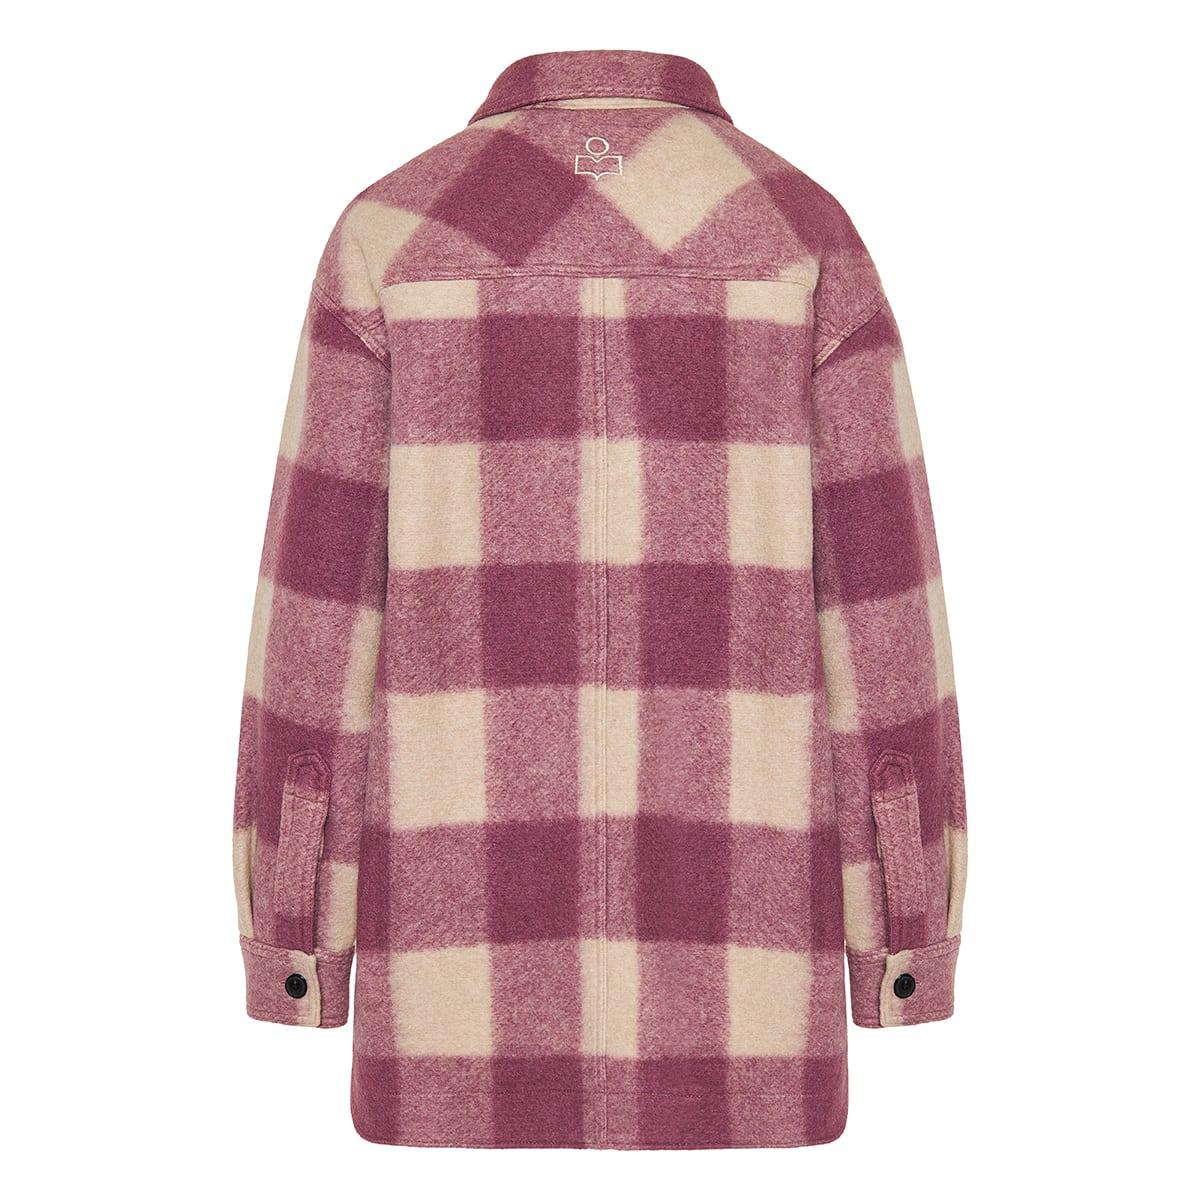 Harveli checked jacket